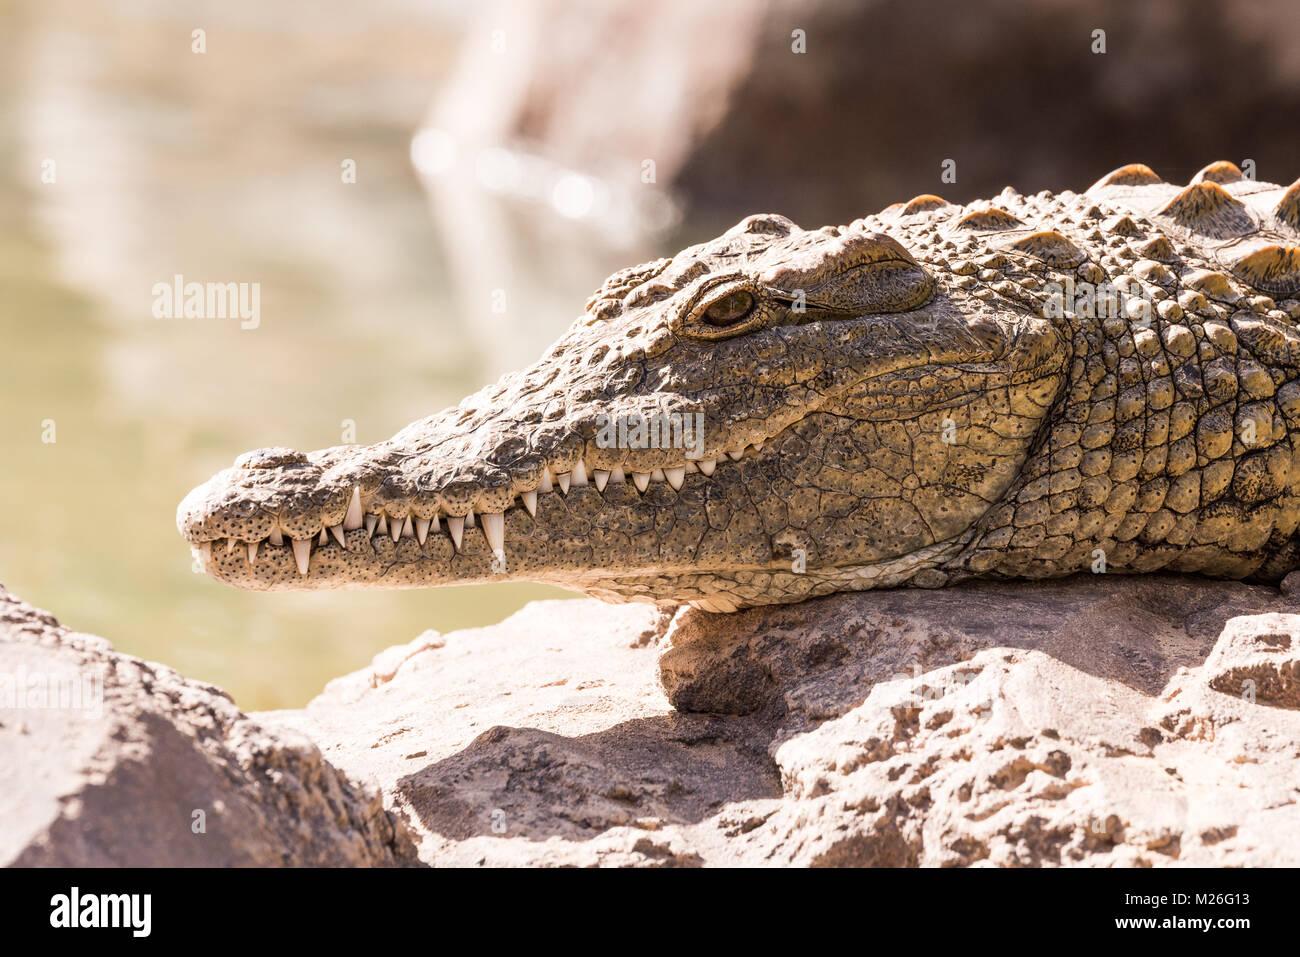 Blick auf ein faules Krokodil oder Alligator Stockfoto